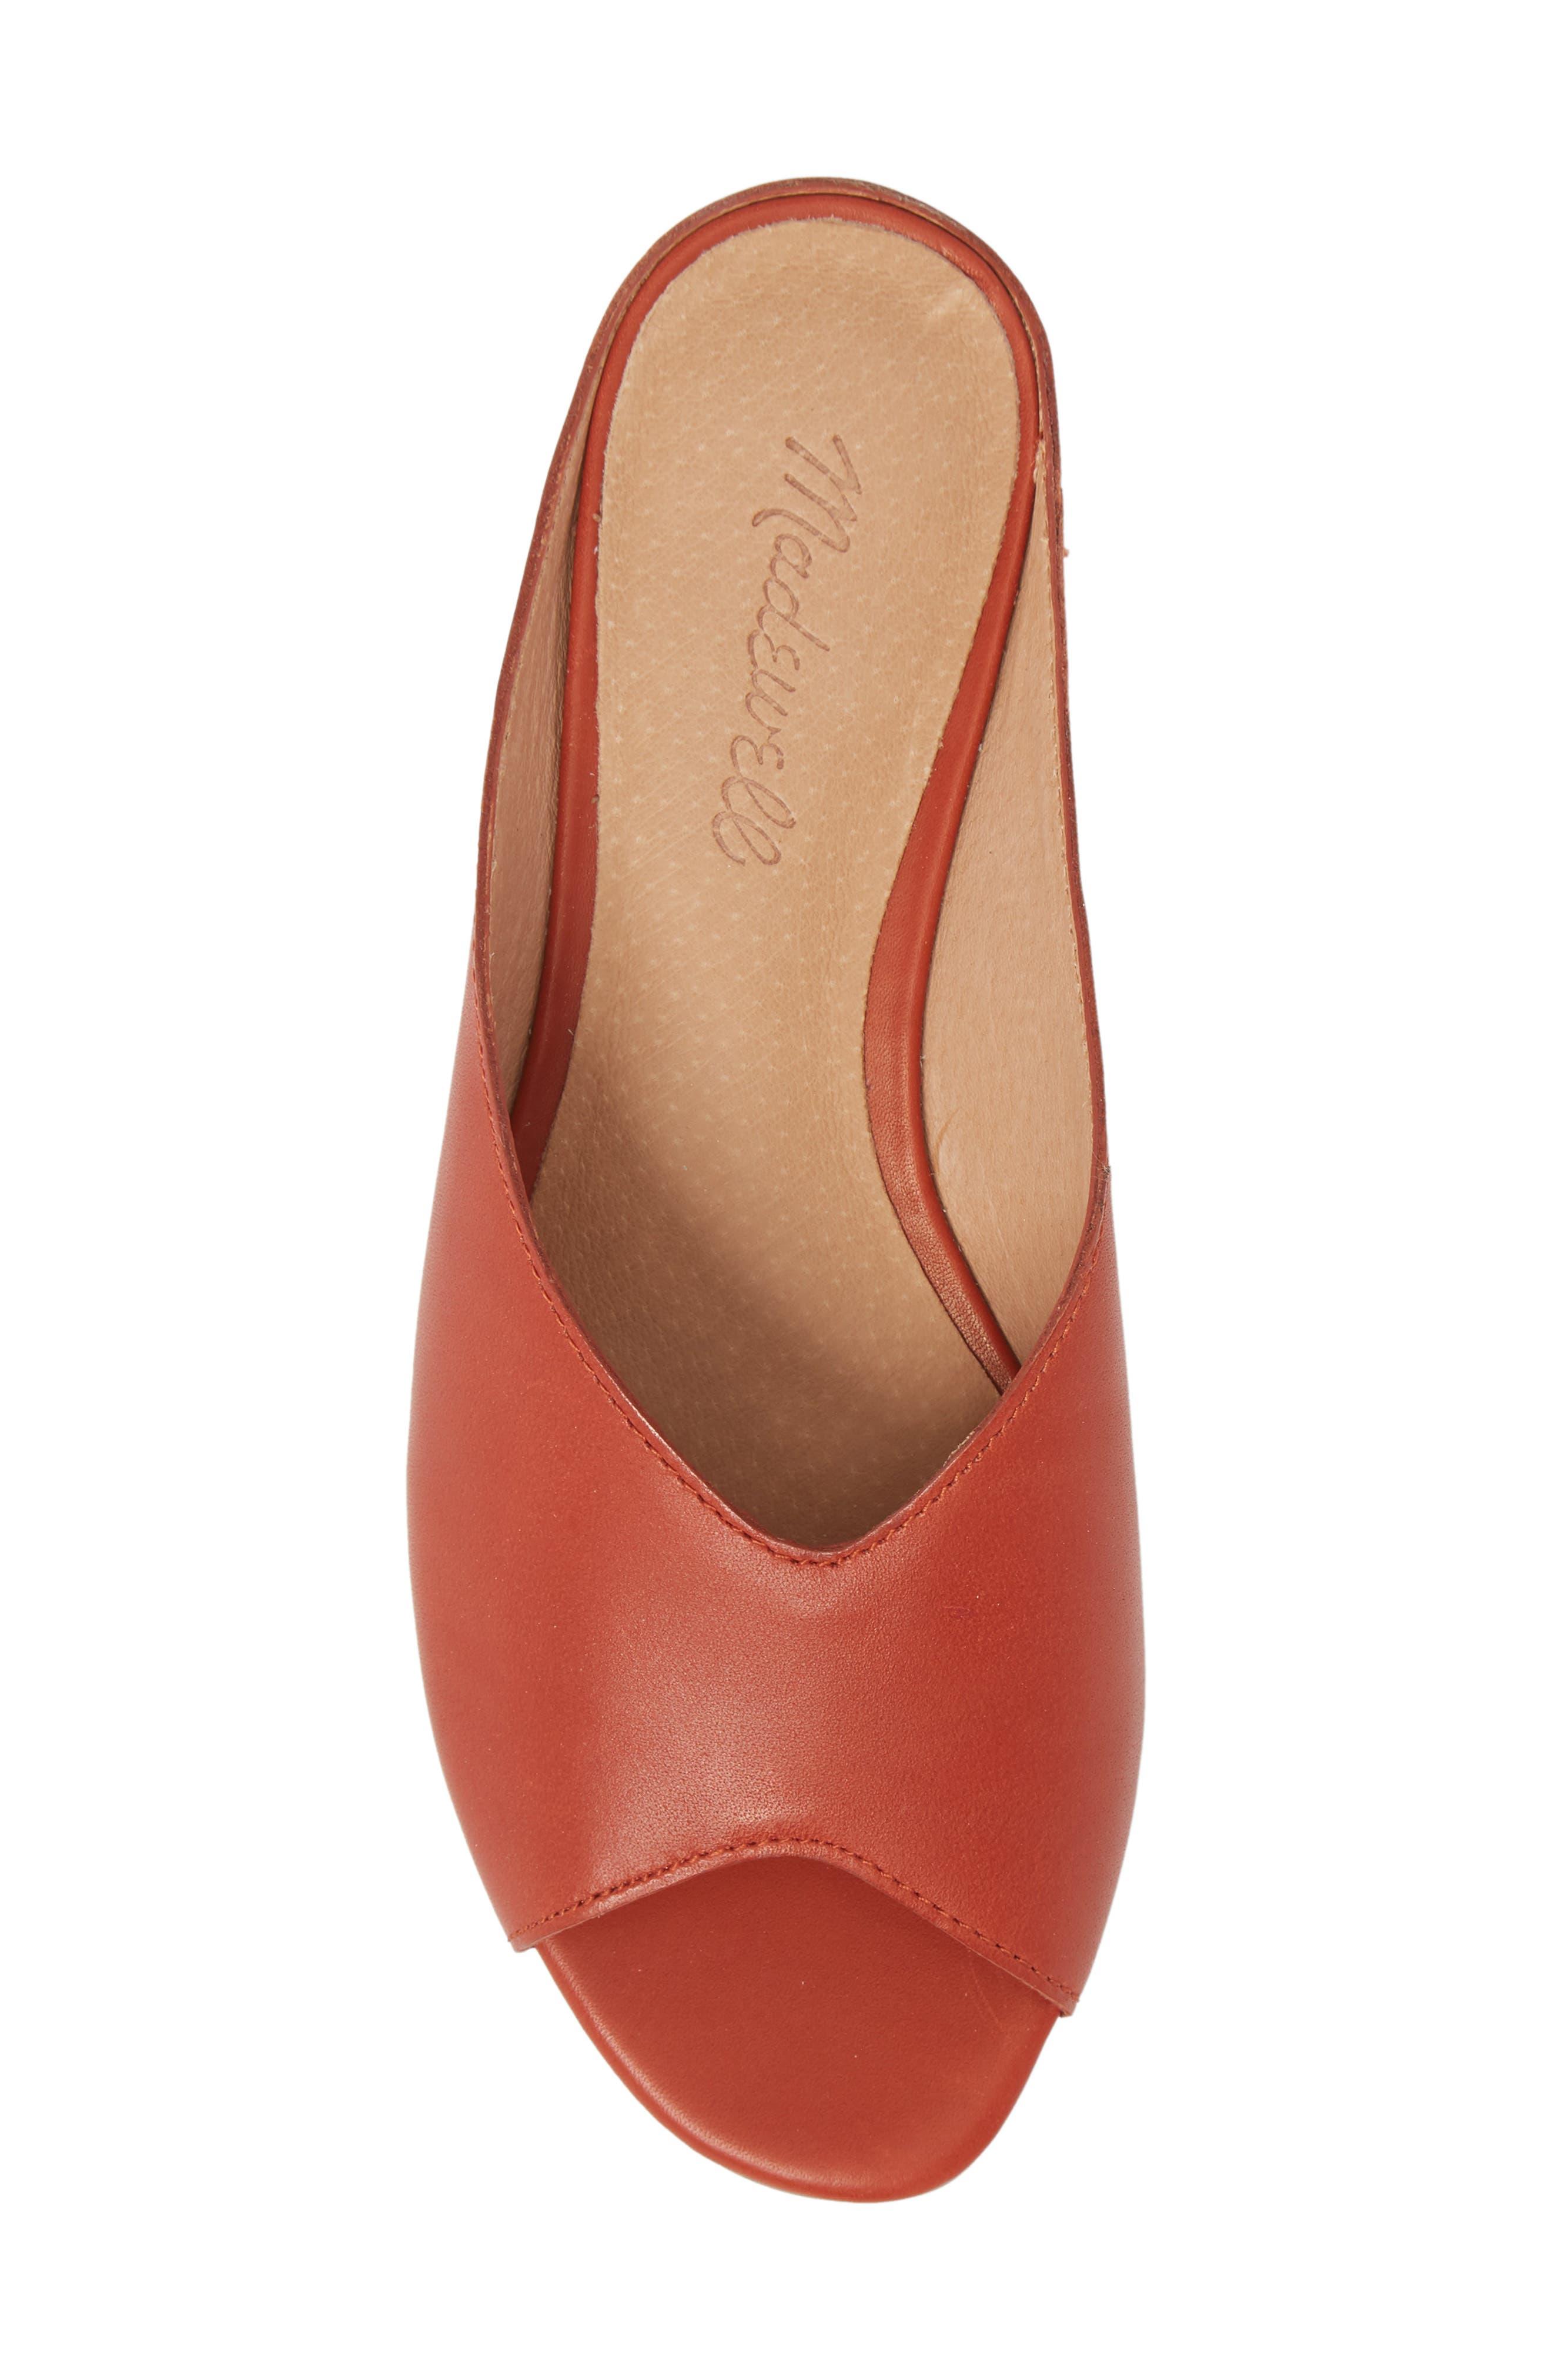 Tavi Slide Sandal,                             Alternate thumbnail 5, color,                             Dark Cinnabar Leather